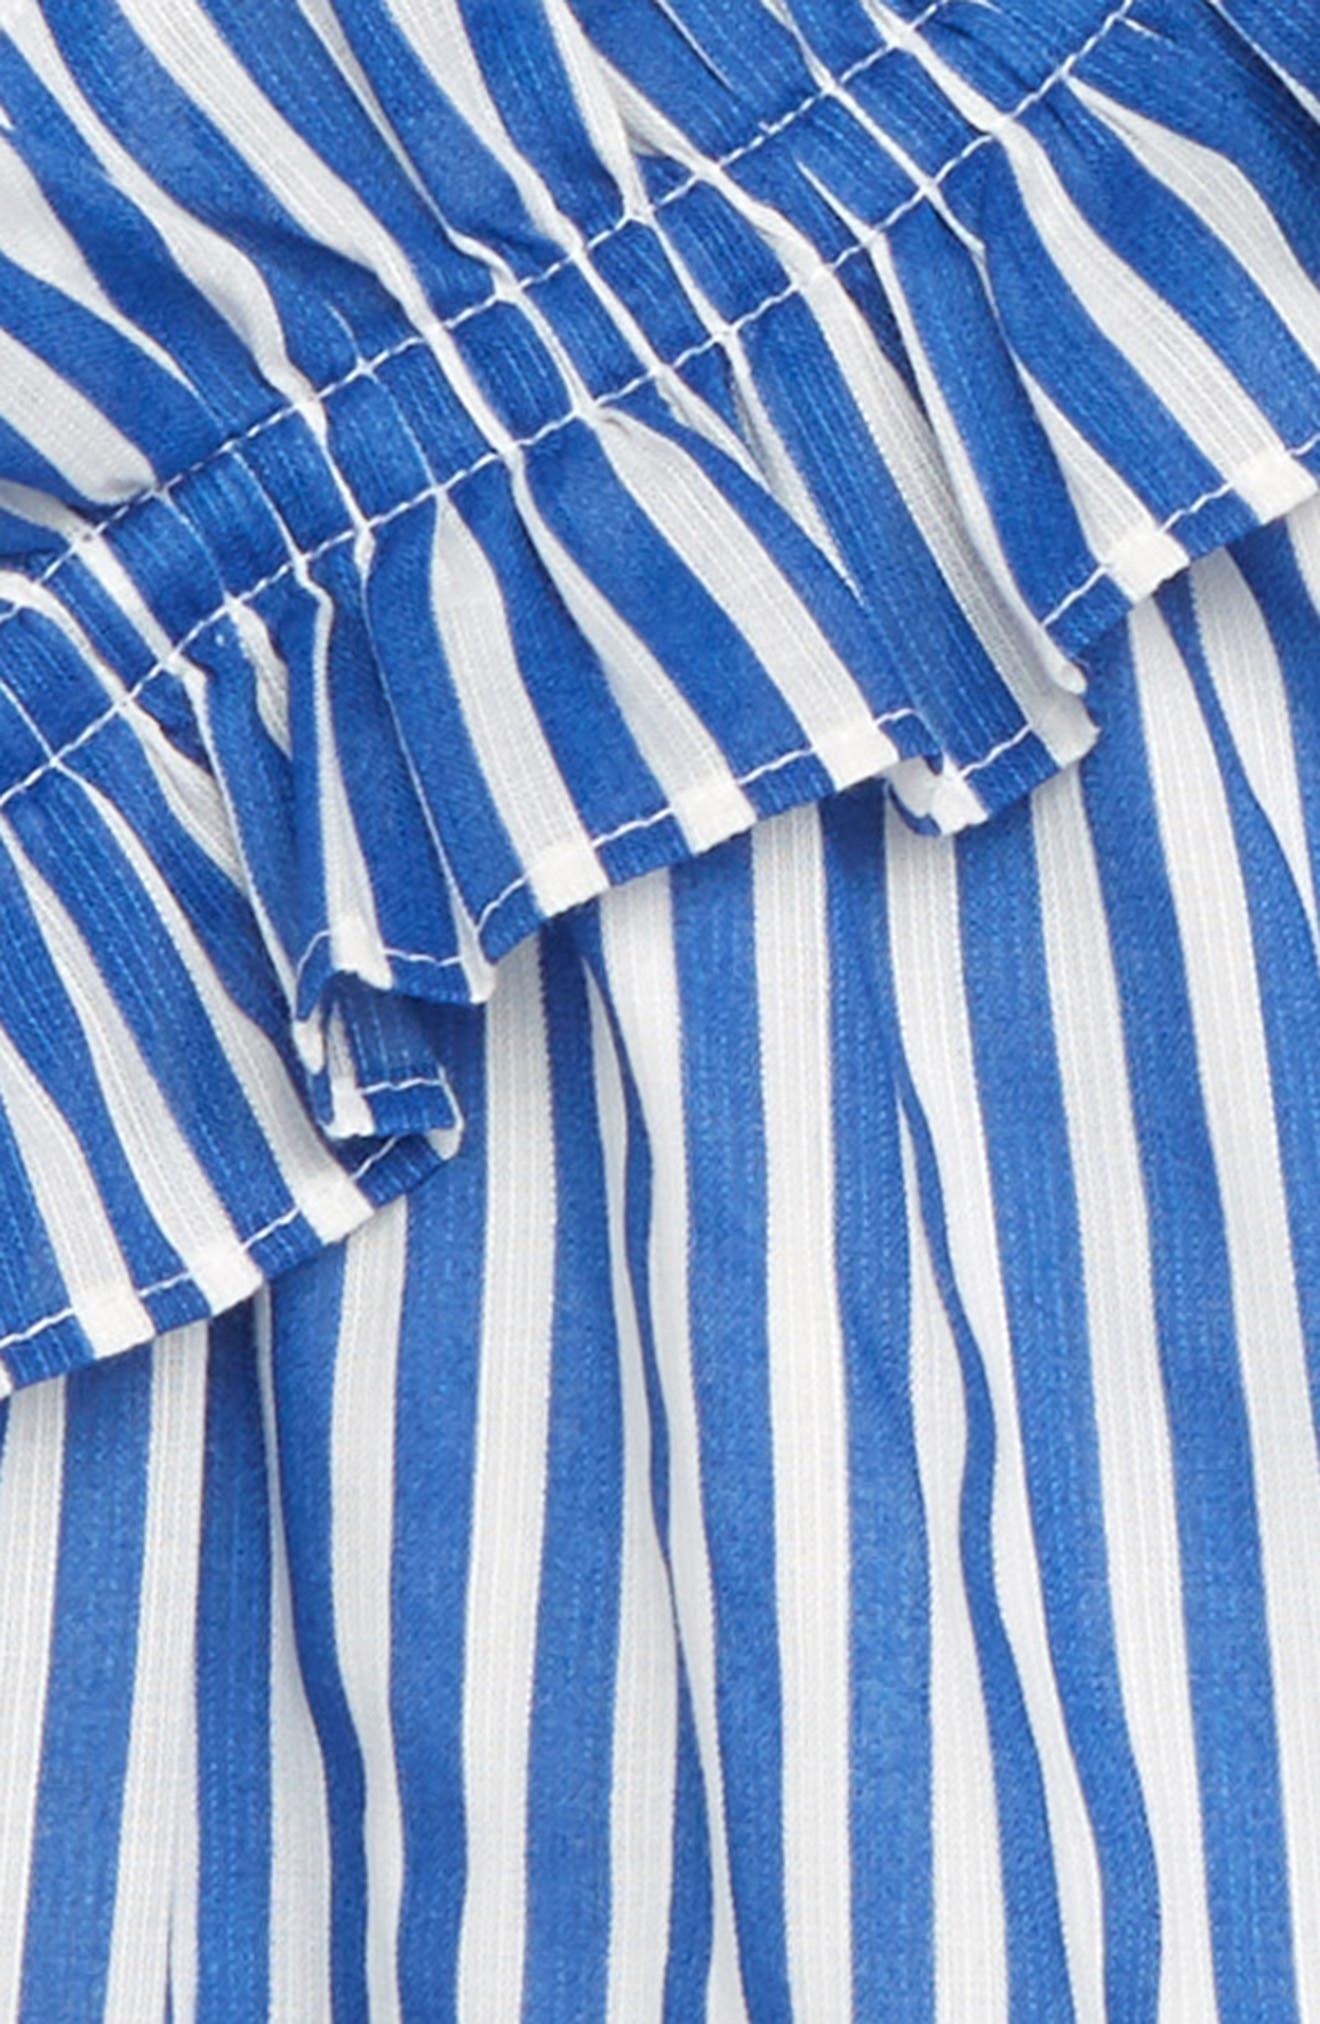 Stripe Asymmetrical Ruffle Top,                             Alternate thumbnail 2, color,                             400